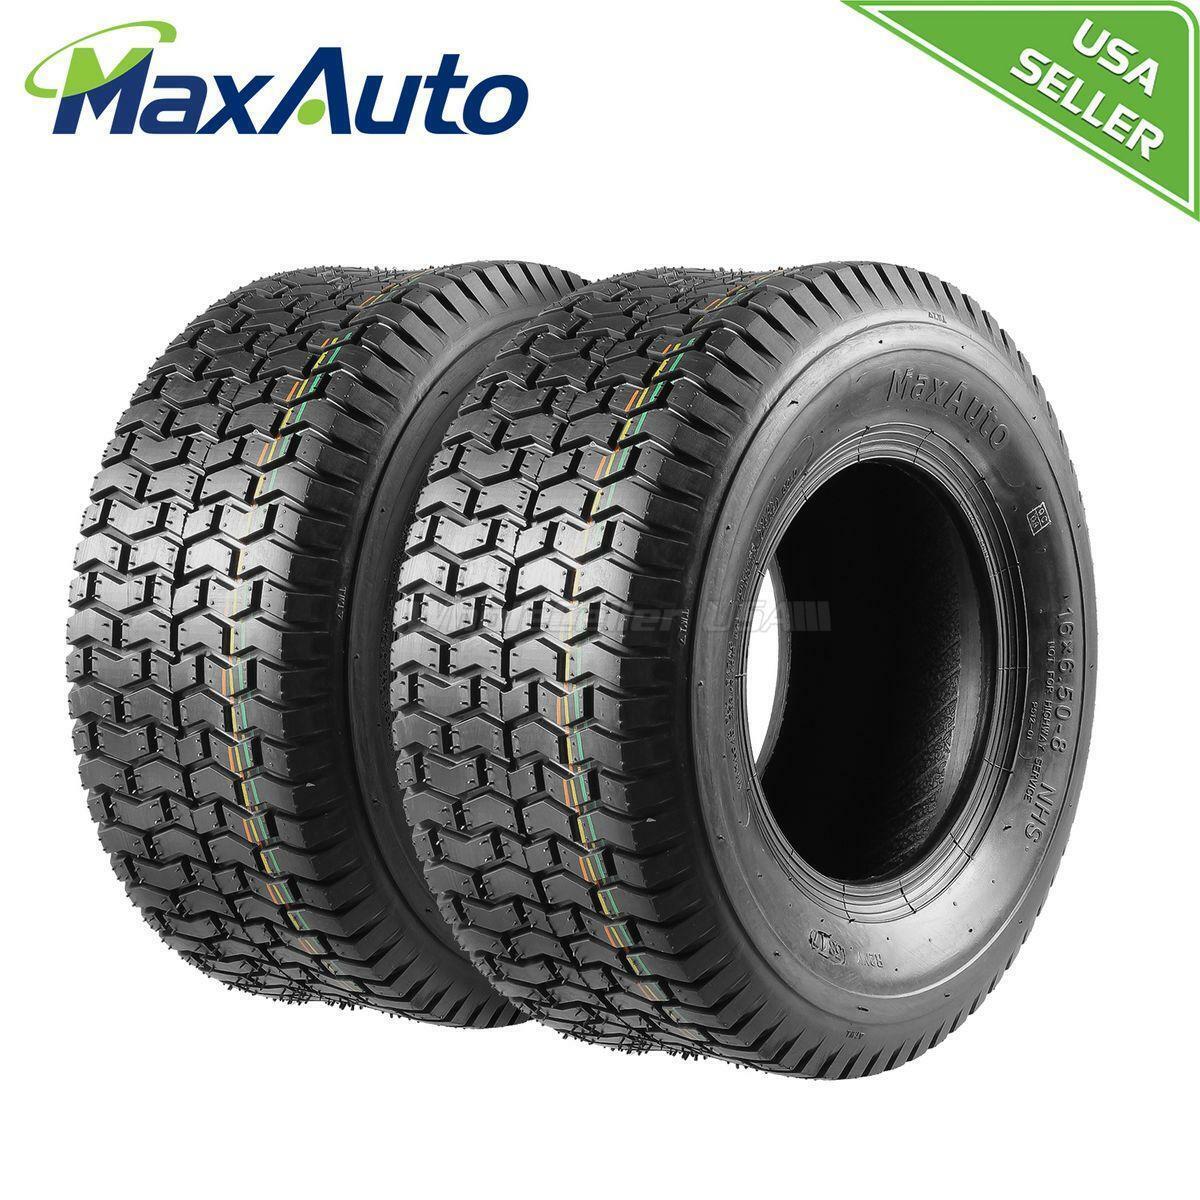 2ply Fits Carlisle Rotary 8541 Tire Turf Saver 16x750x8 16x7.50x8